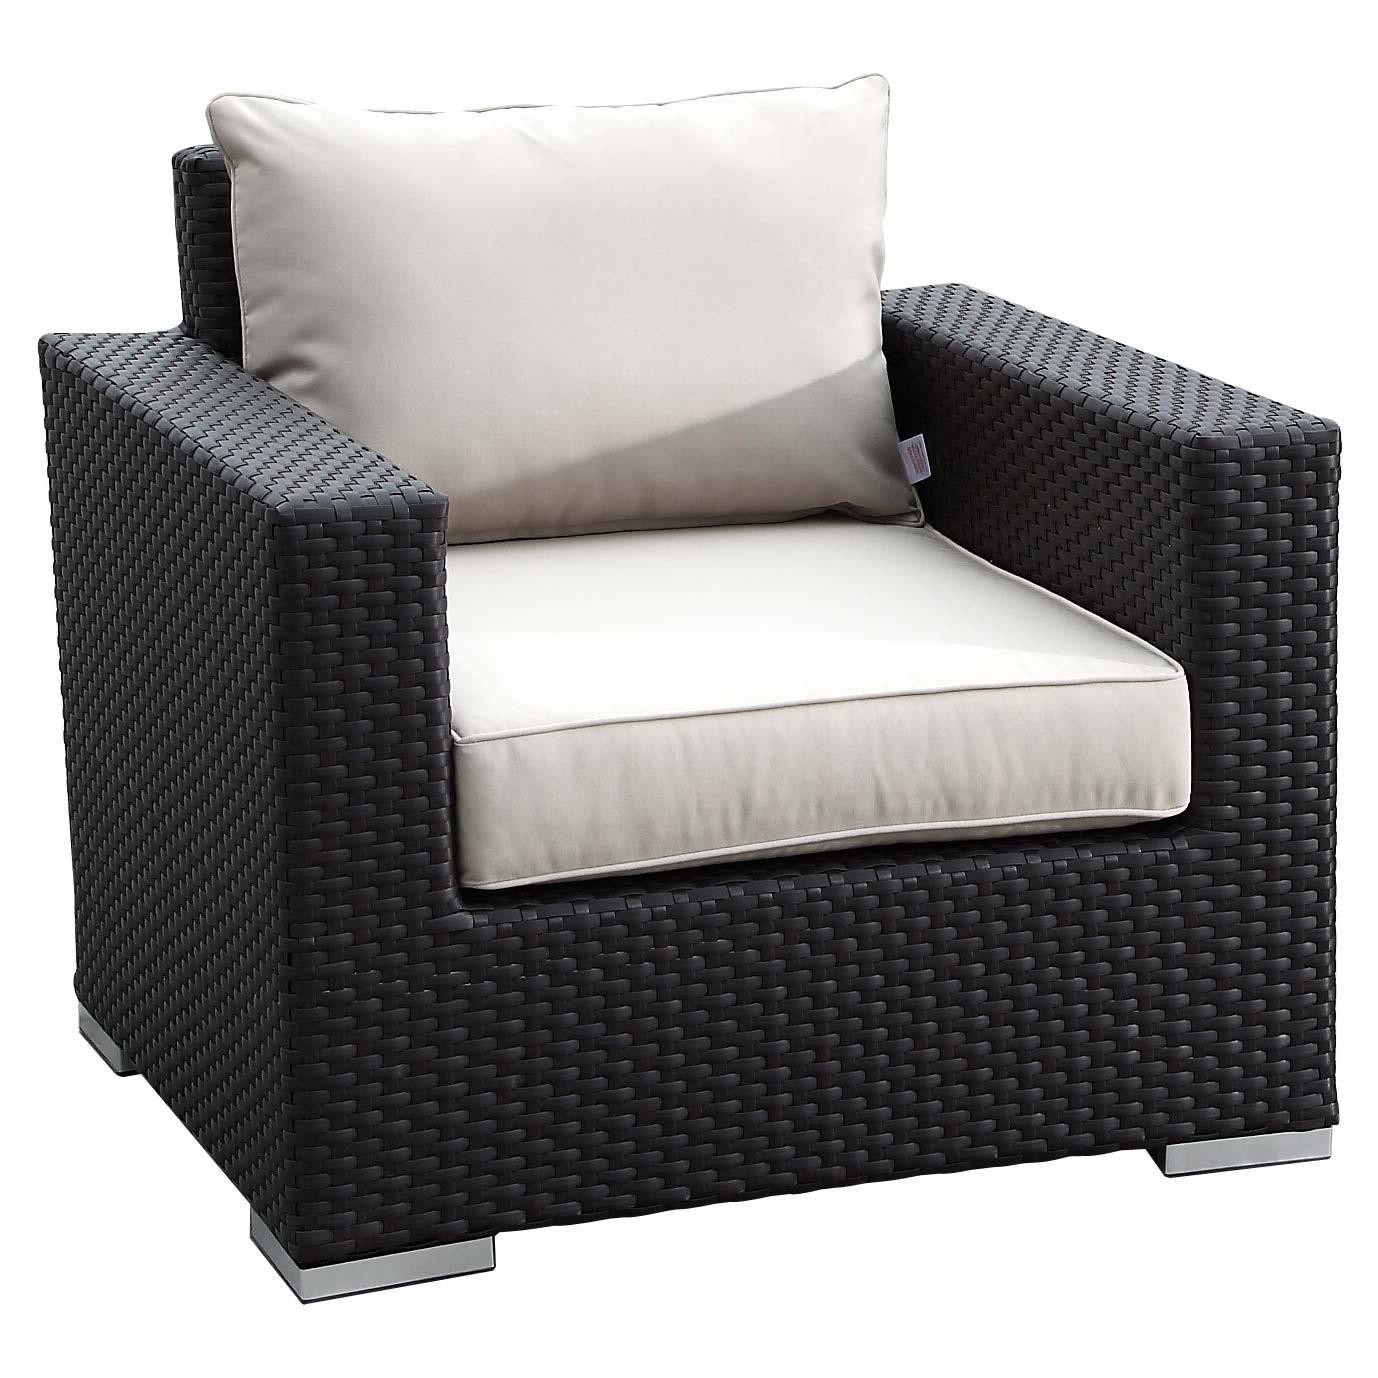 Sunset west solana wicker 6 piece conversation set - Conversation set replacement cushions ...